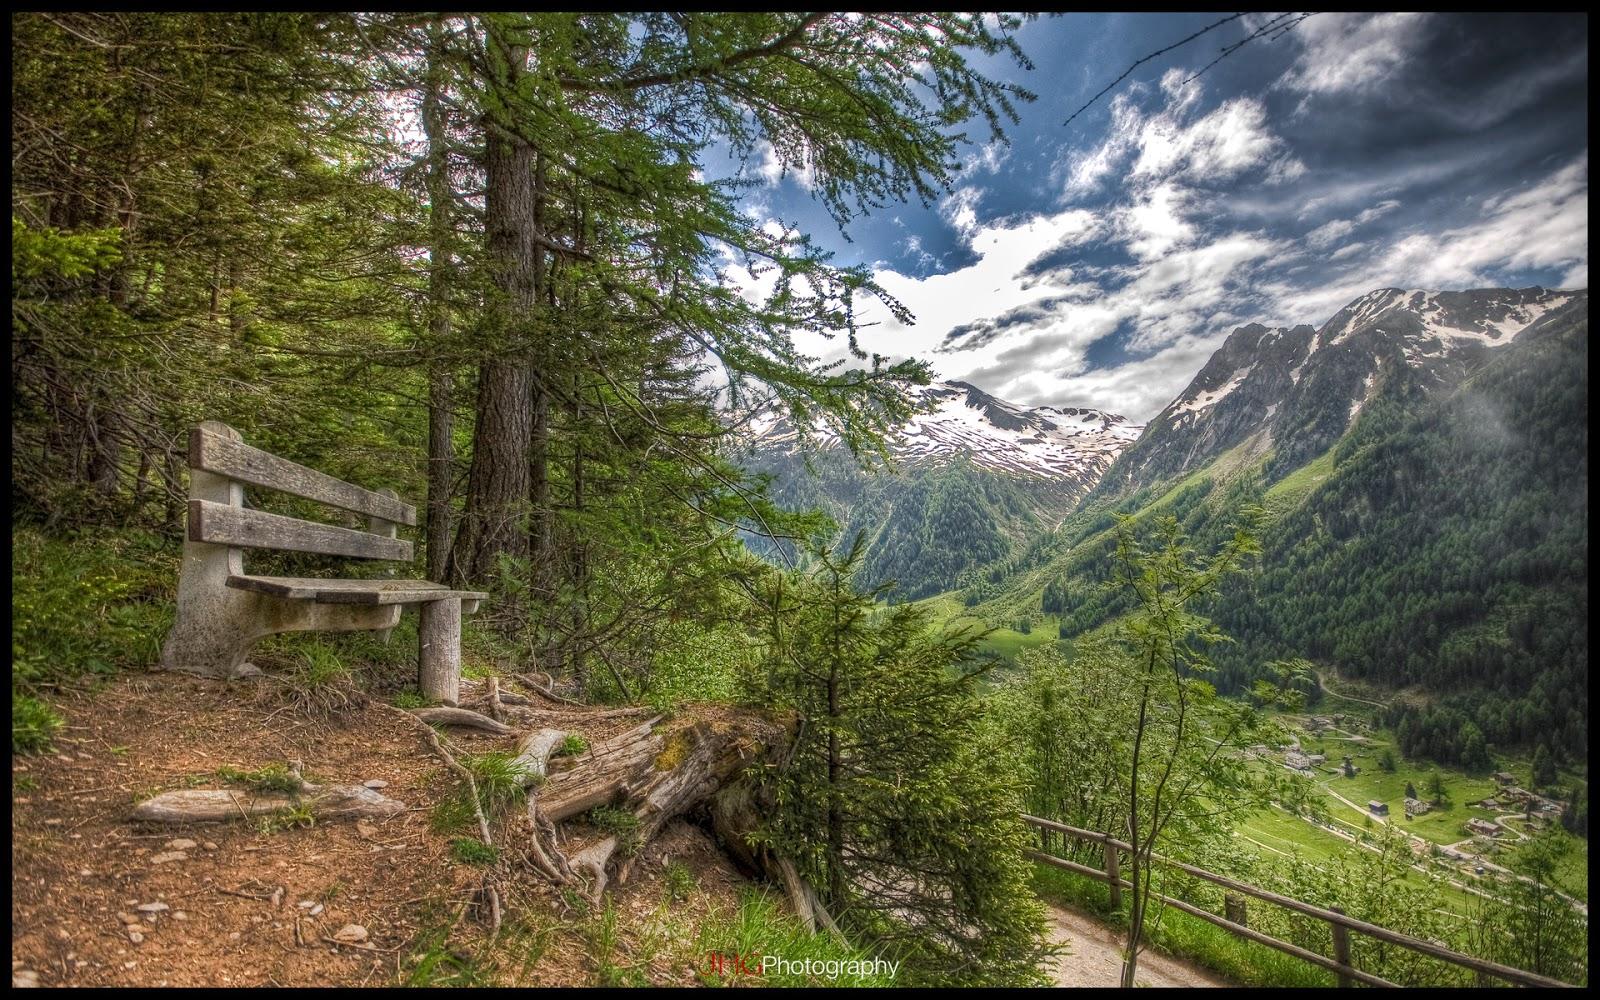 Fantastic Wallpaper Mountain Google - La+Forclaz+Valais+2+-+1920+1200  Snapshot_119520.jpg